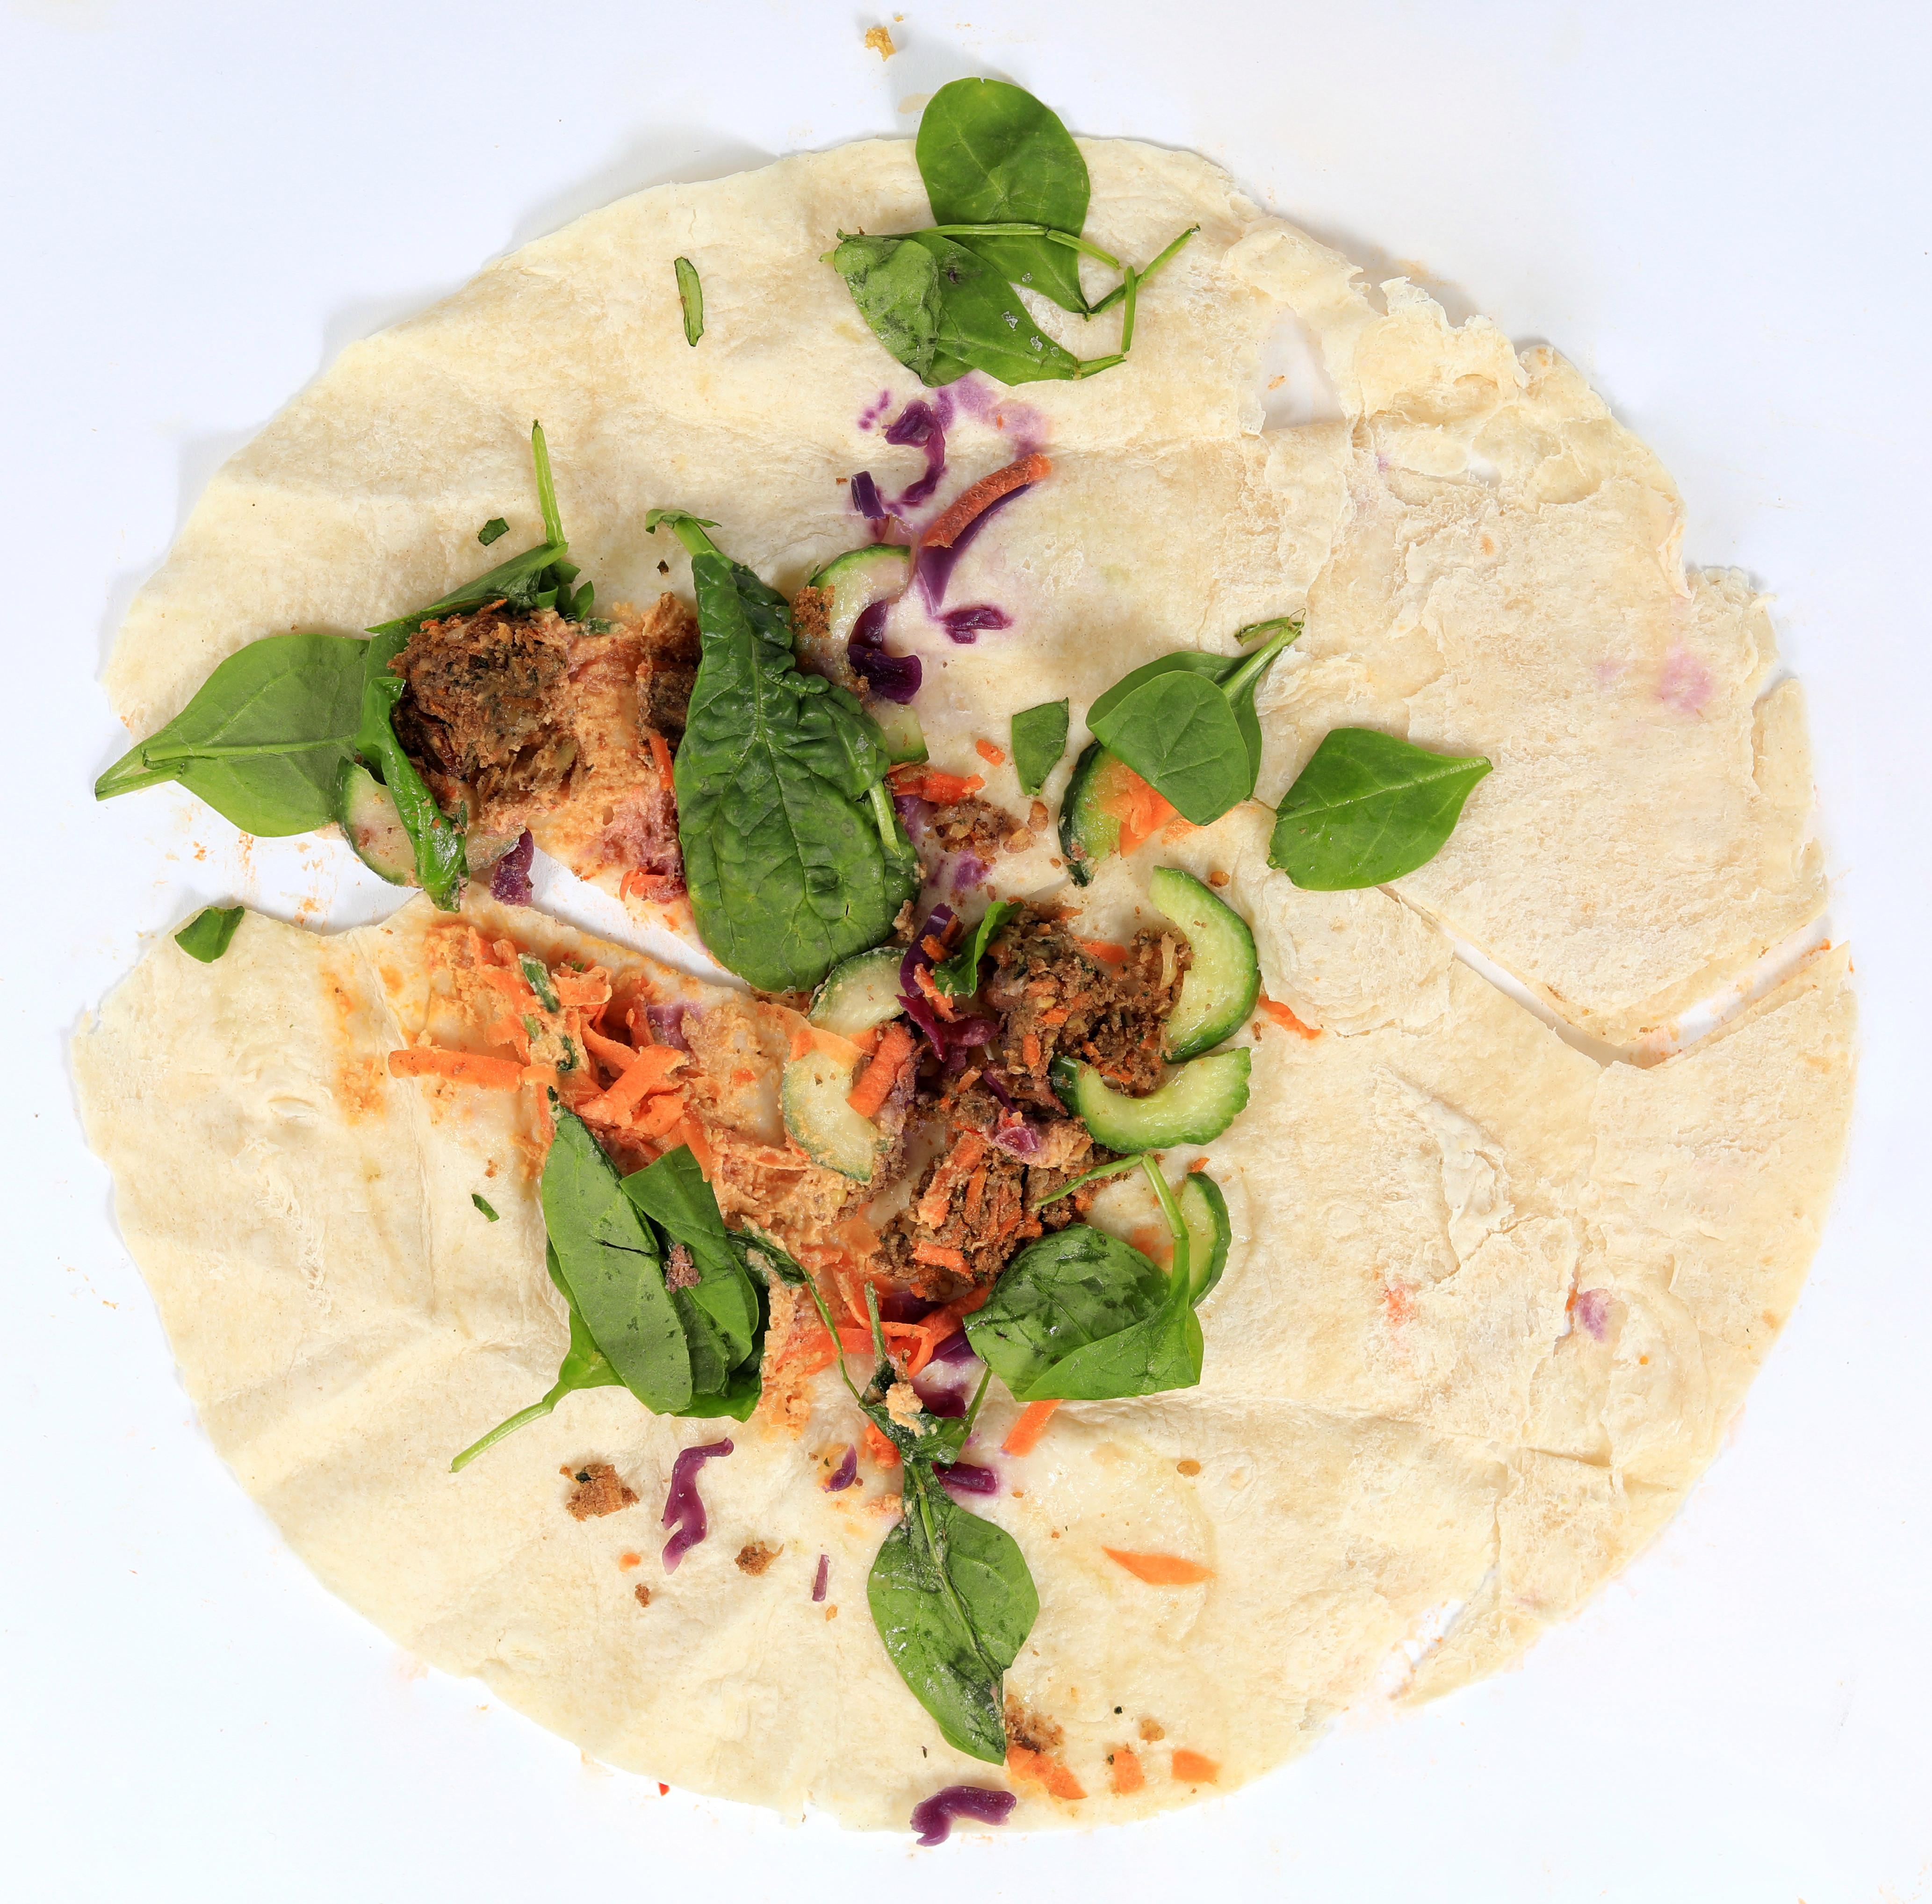 Sainsbury's: Festive Falafel & Hummus